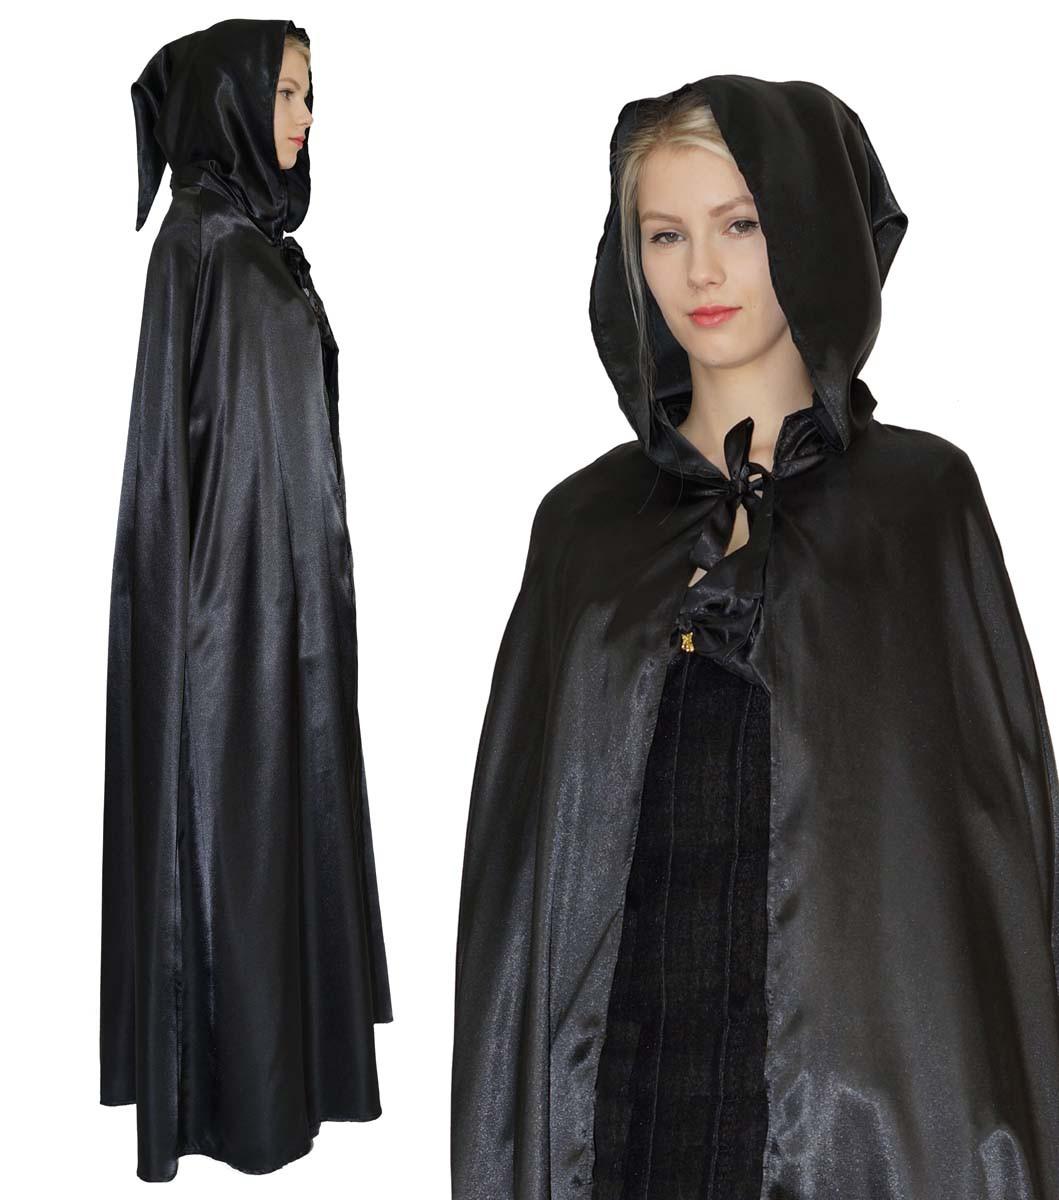 umhang mittelalter cape vampir kost m hexe f r damen. Black Bedroom Furniture Sets. Home Design Ideas